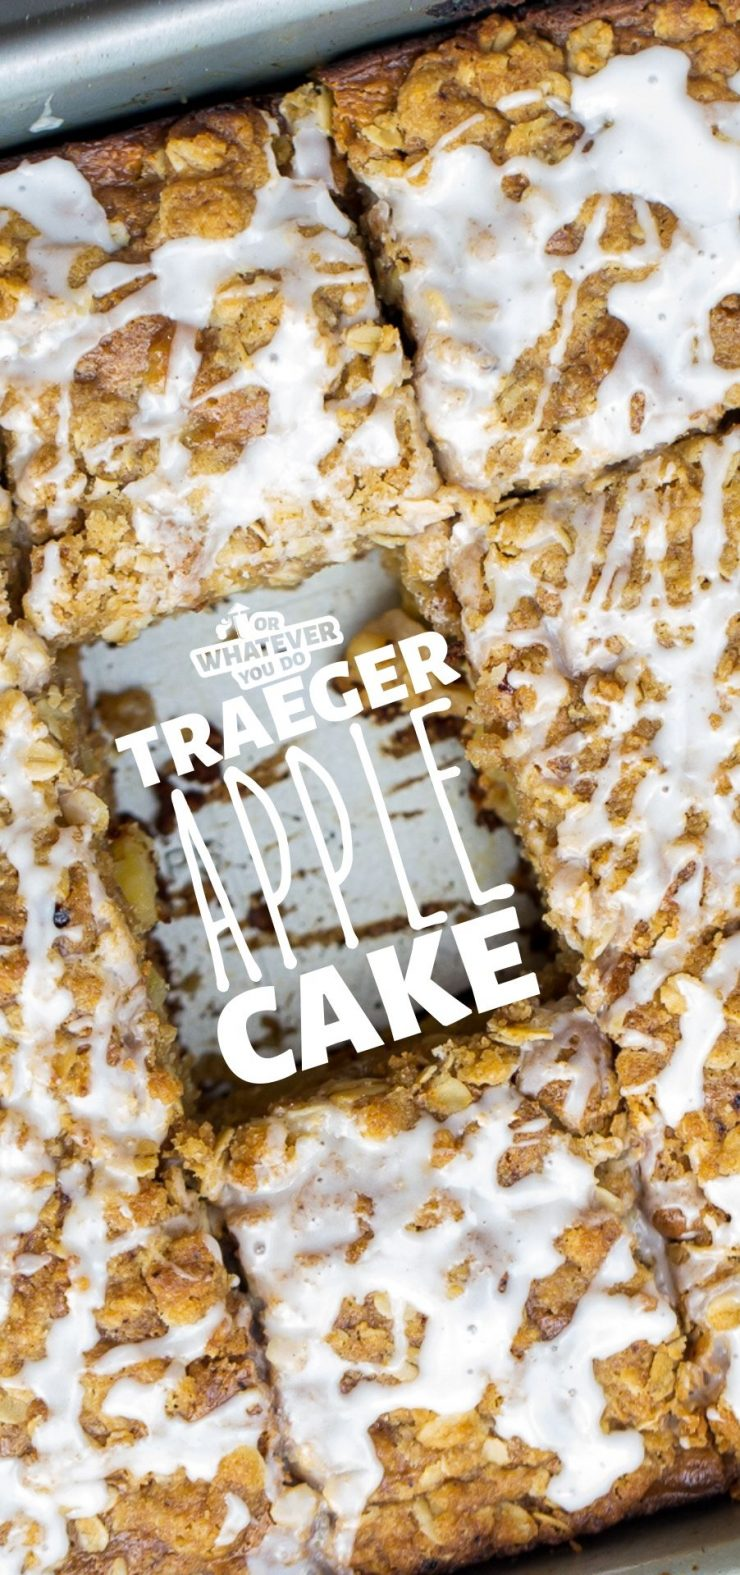 Traeger Apple Cake